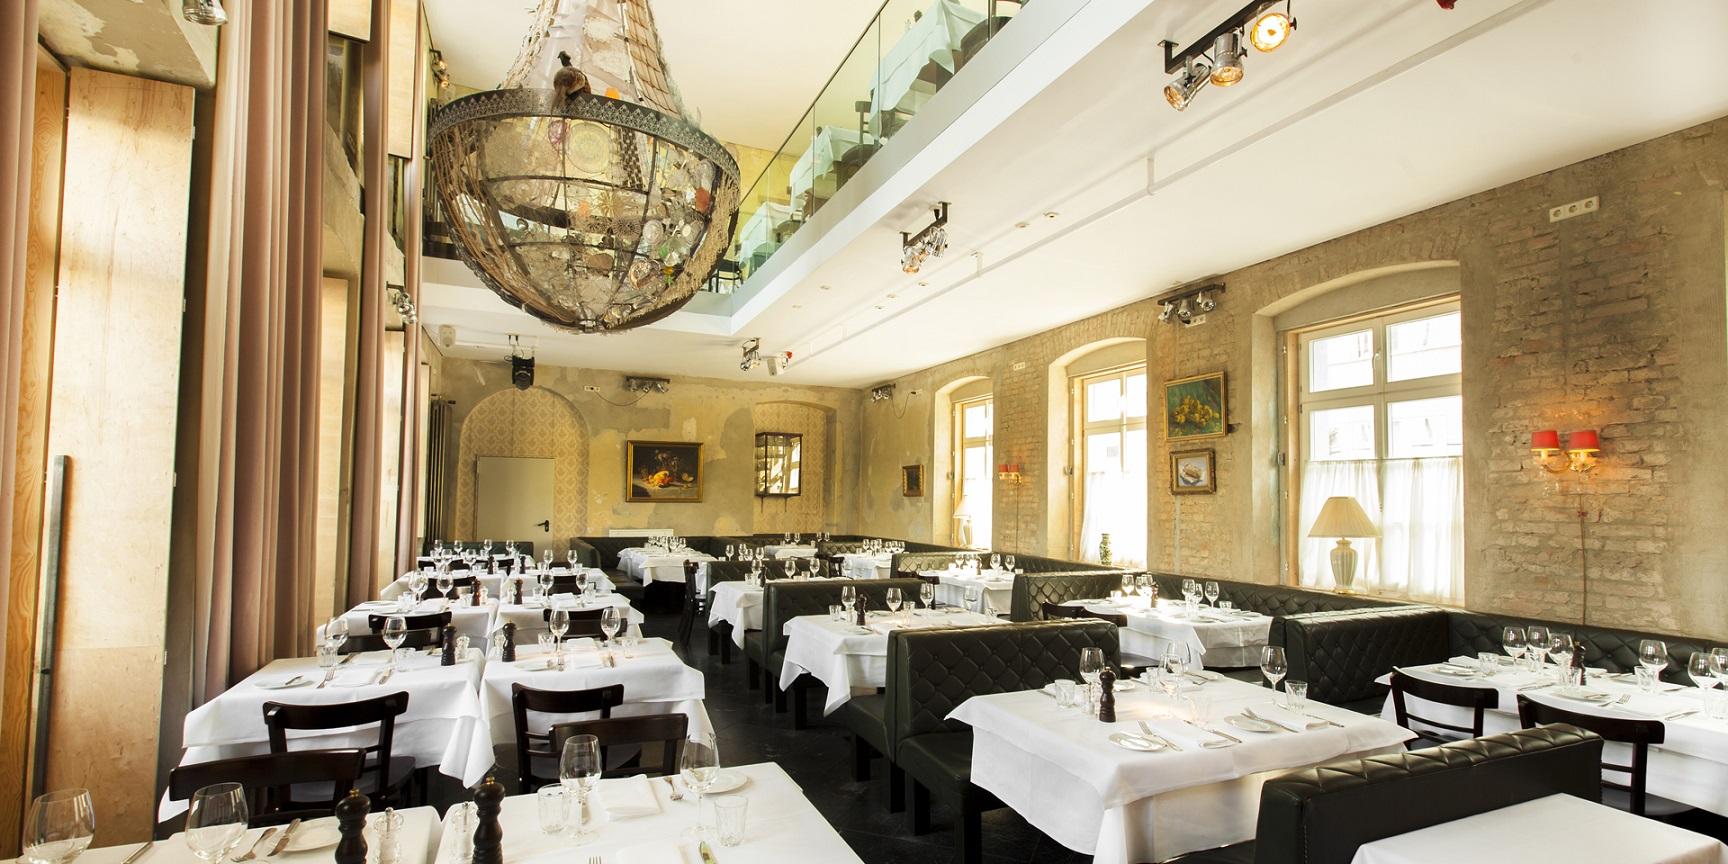 Mittagessen berlin wedding venues